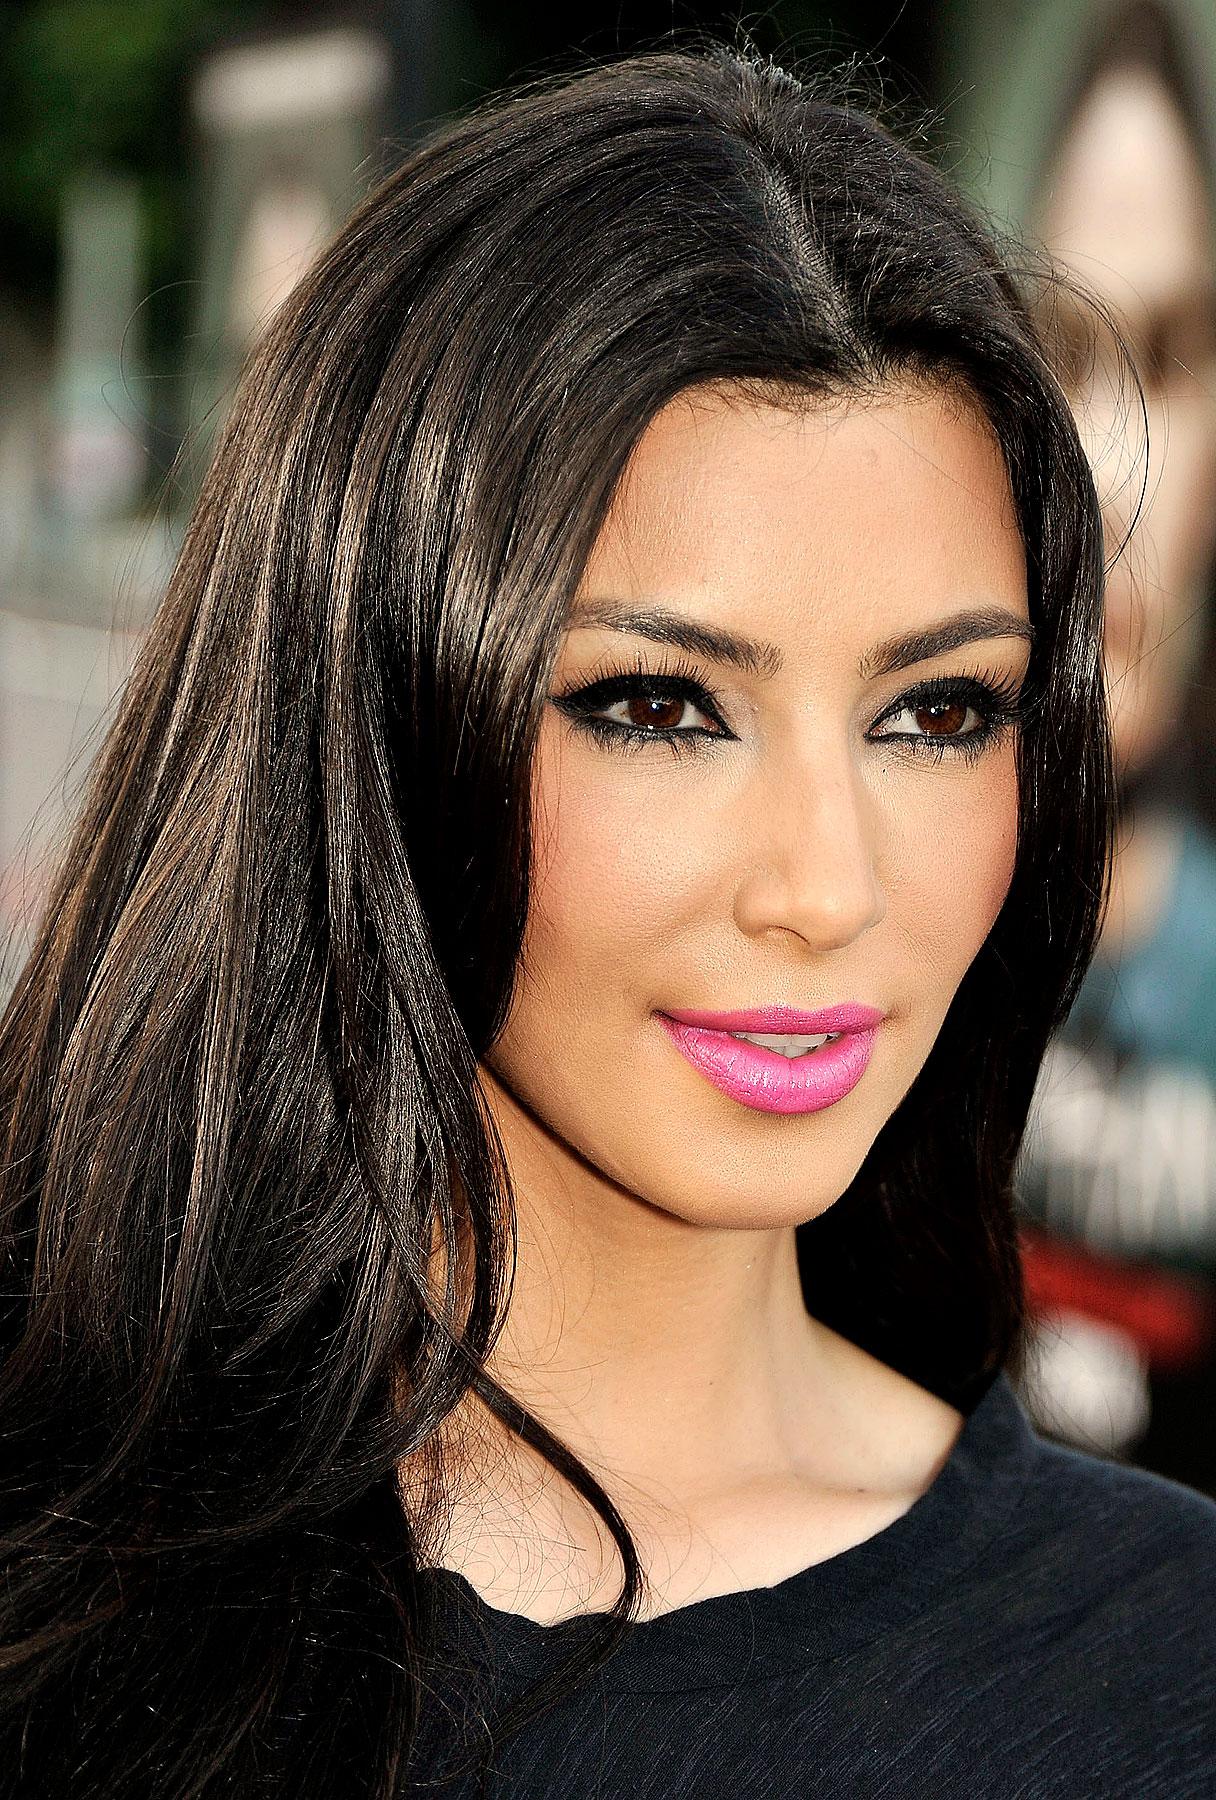 Kim Kardashian Makes Statement on Breakup